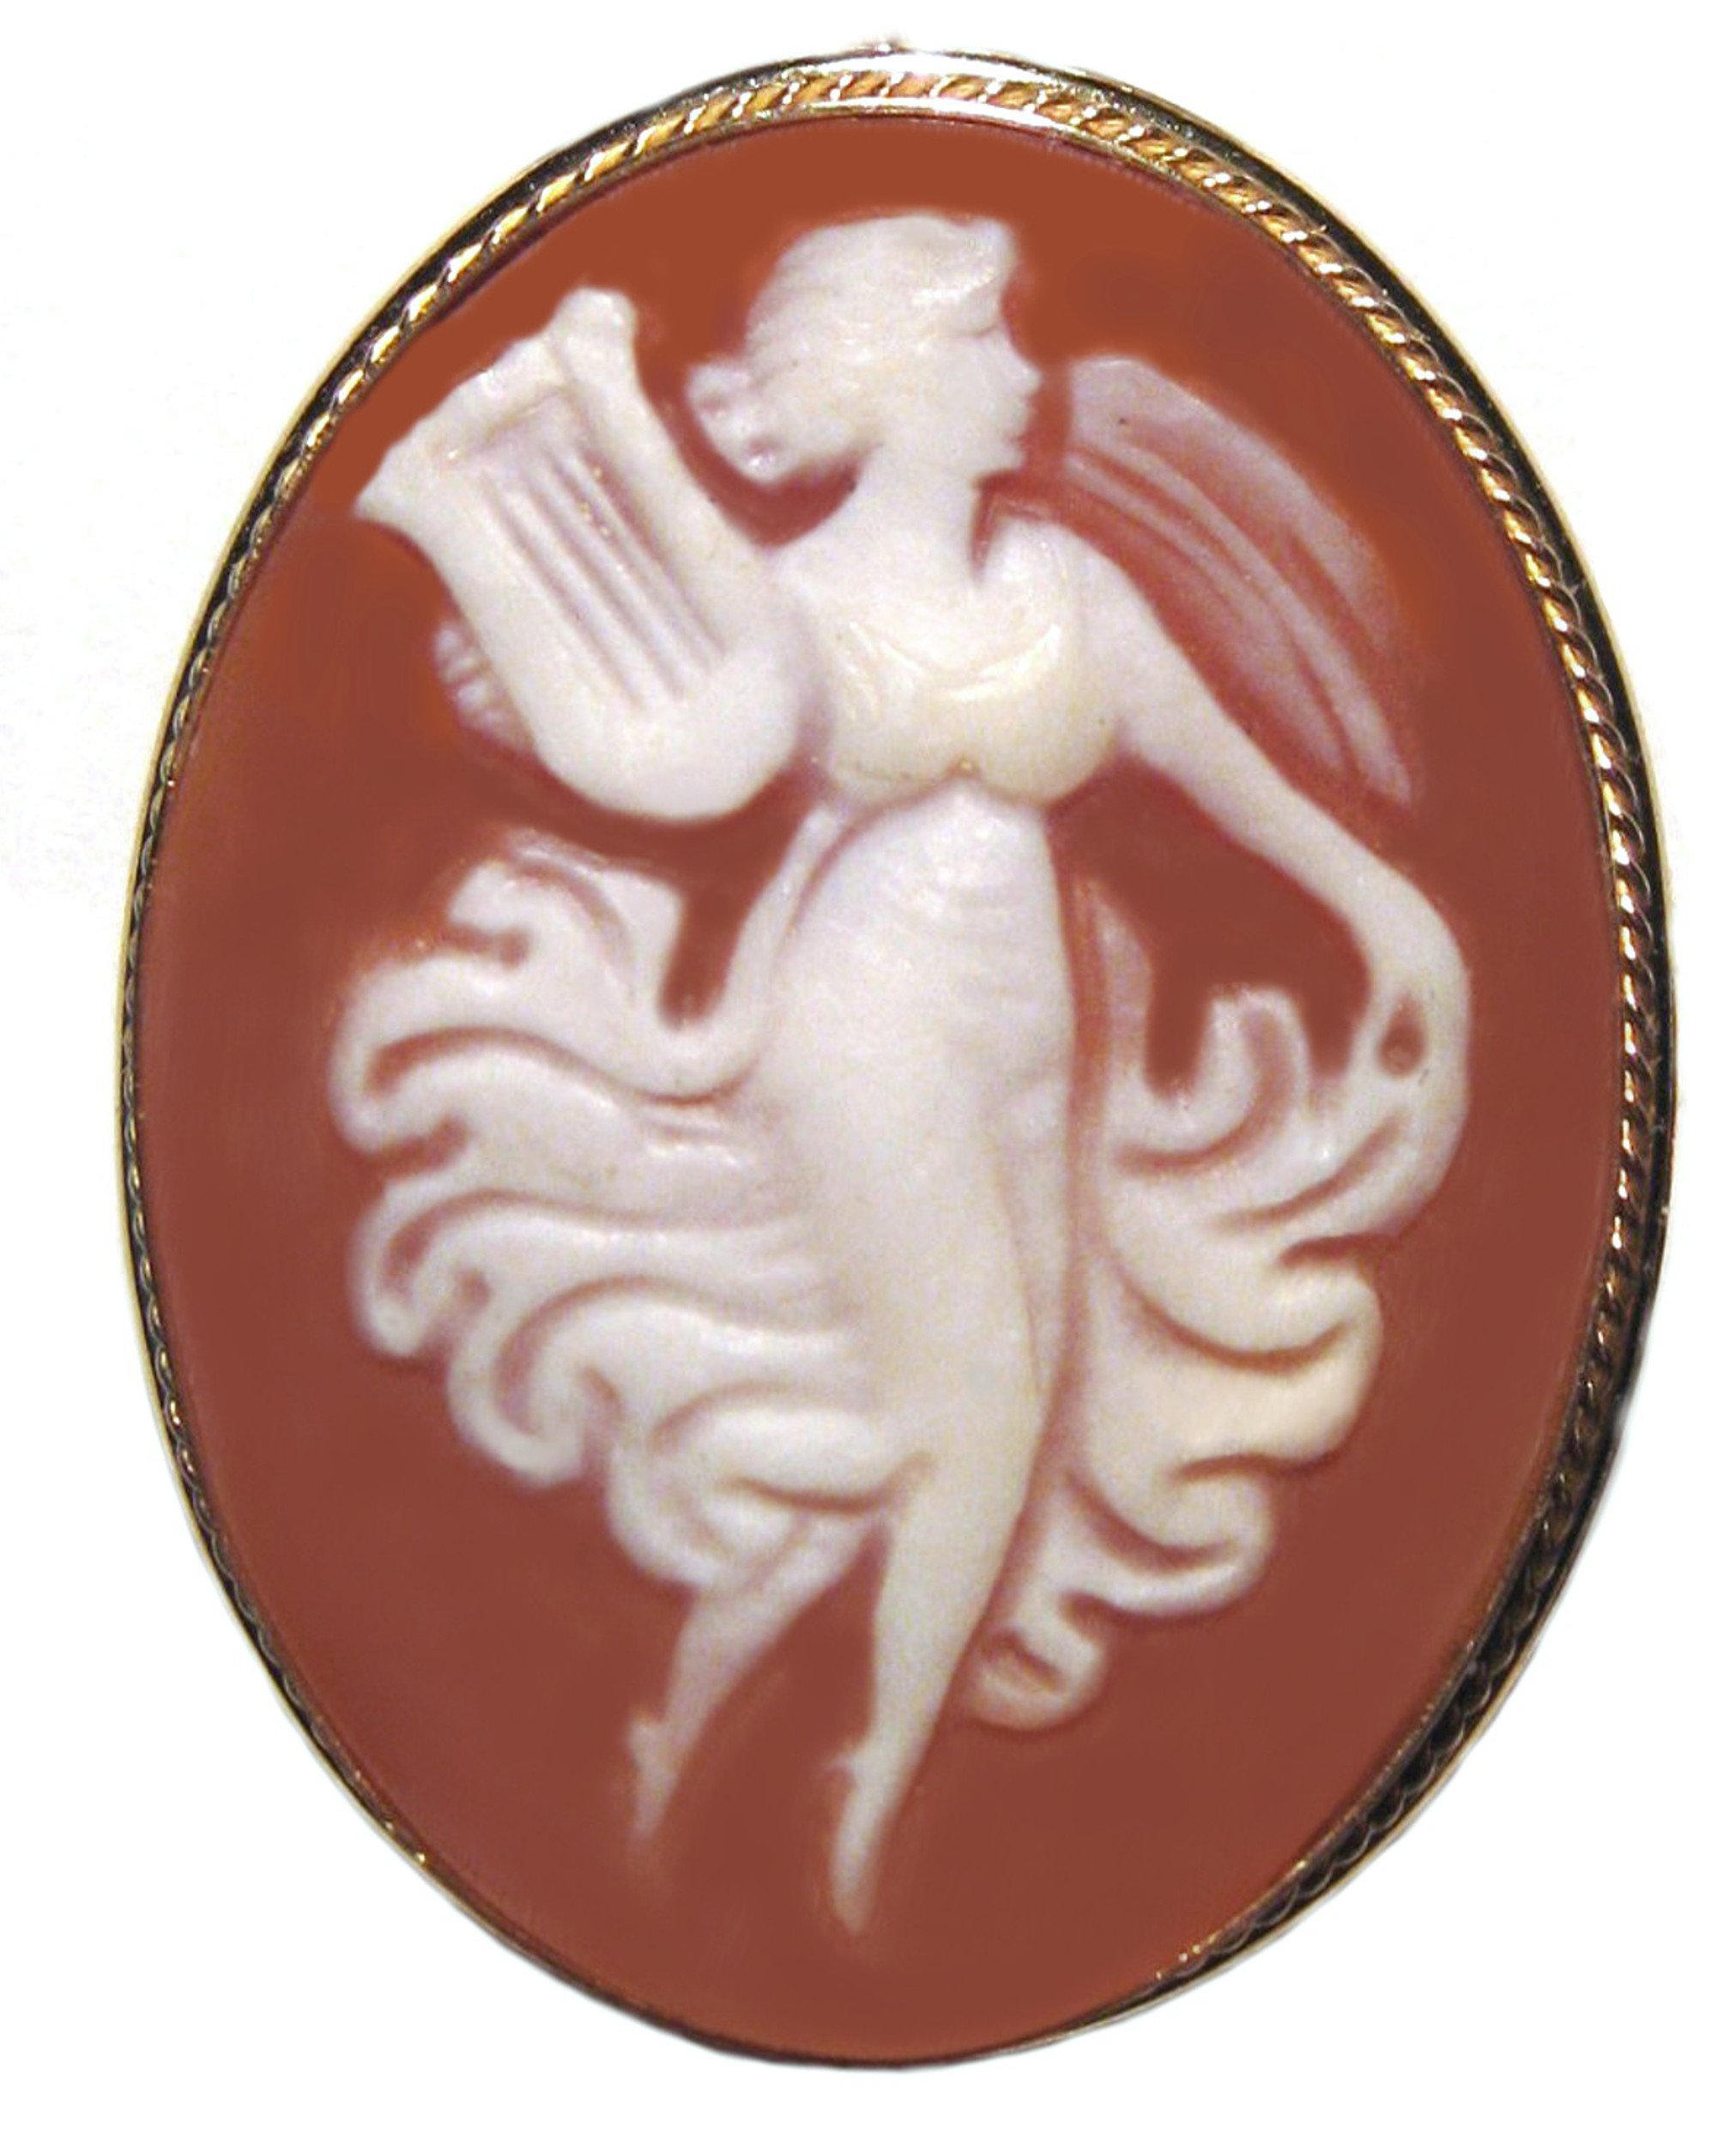 Cameo Broach Pendant Enhancer Master Carved, Goddess of Music Shell Italian Sterling Silver